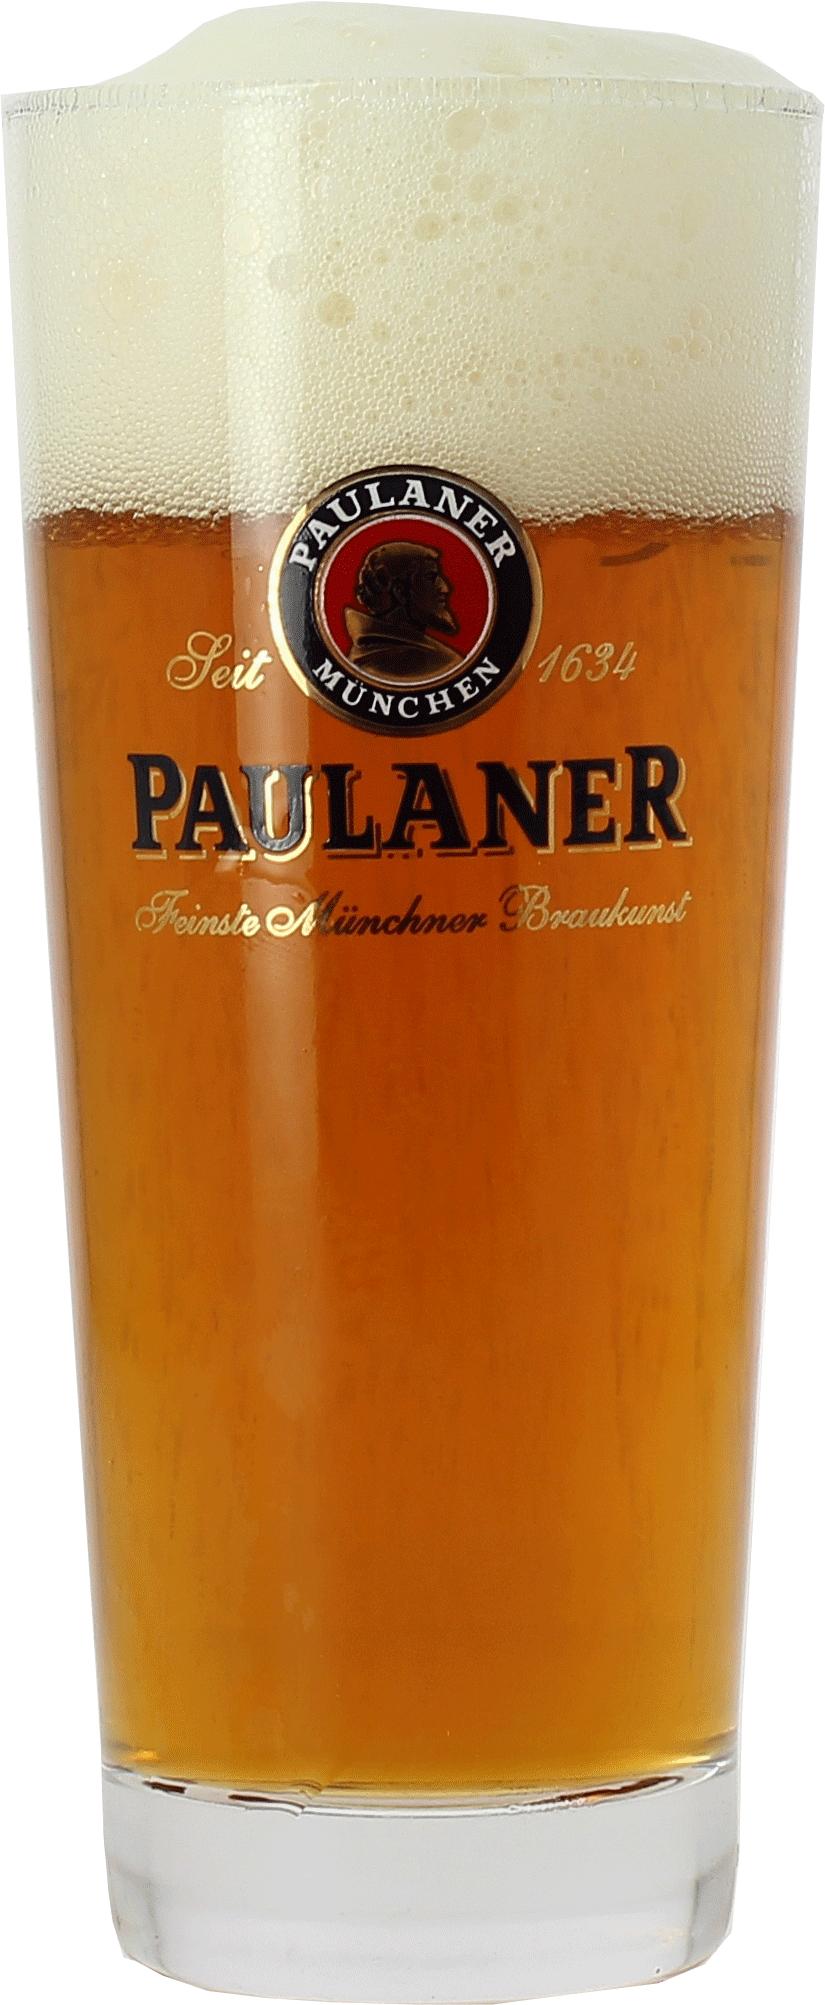 Beer Paulaner (Paulaner) - real German quality 8